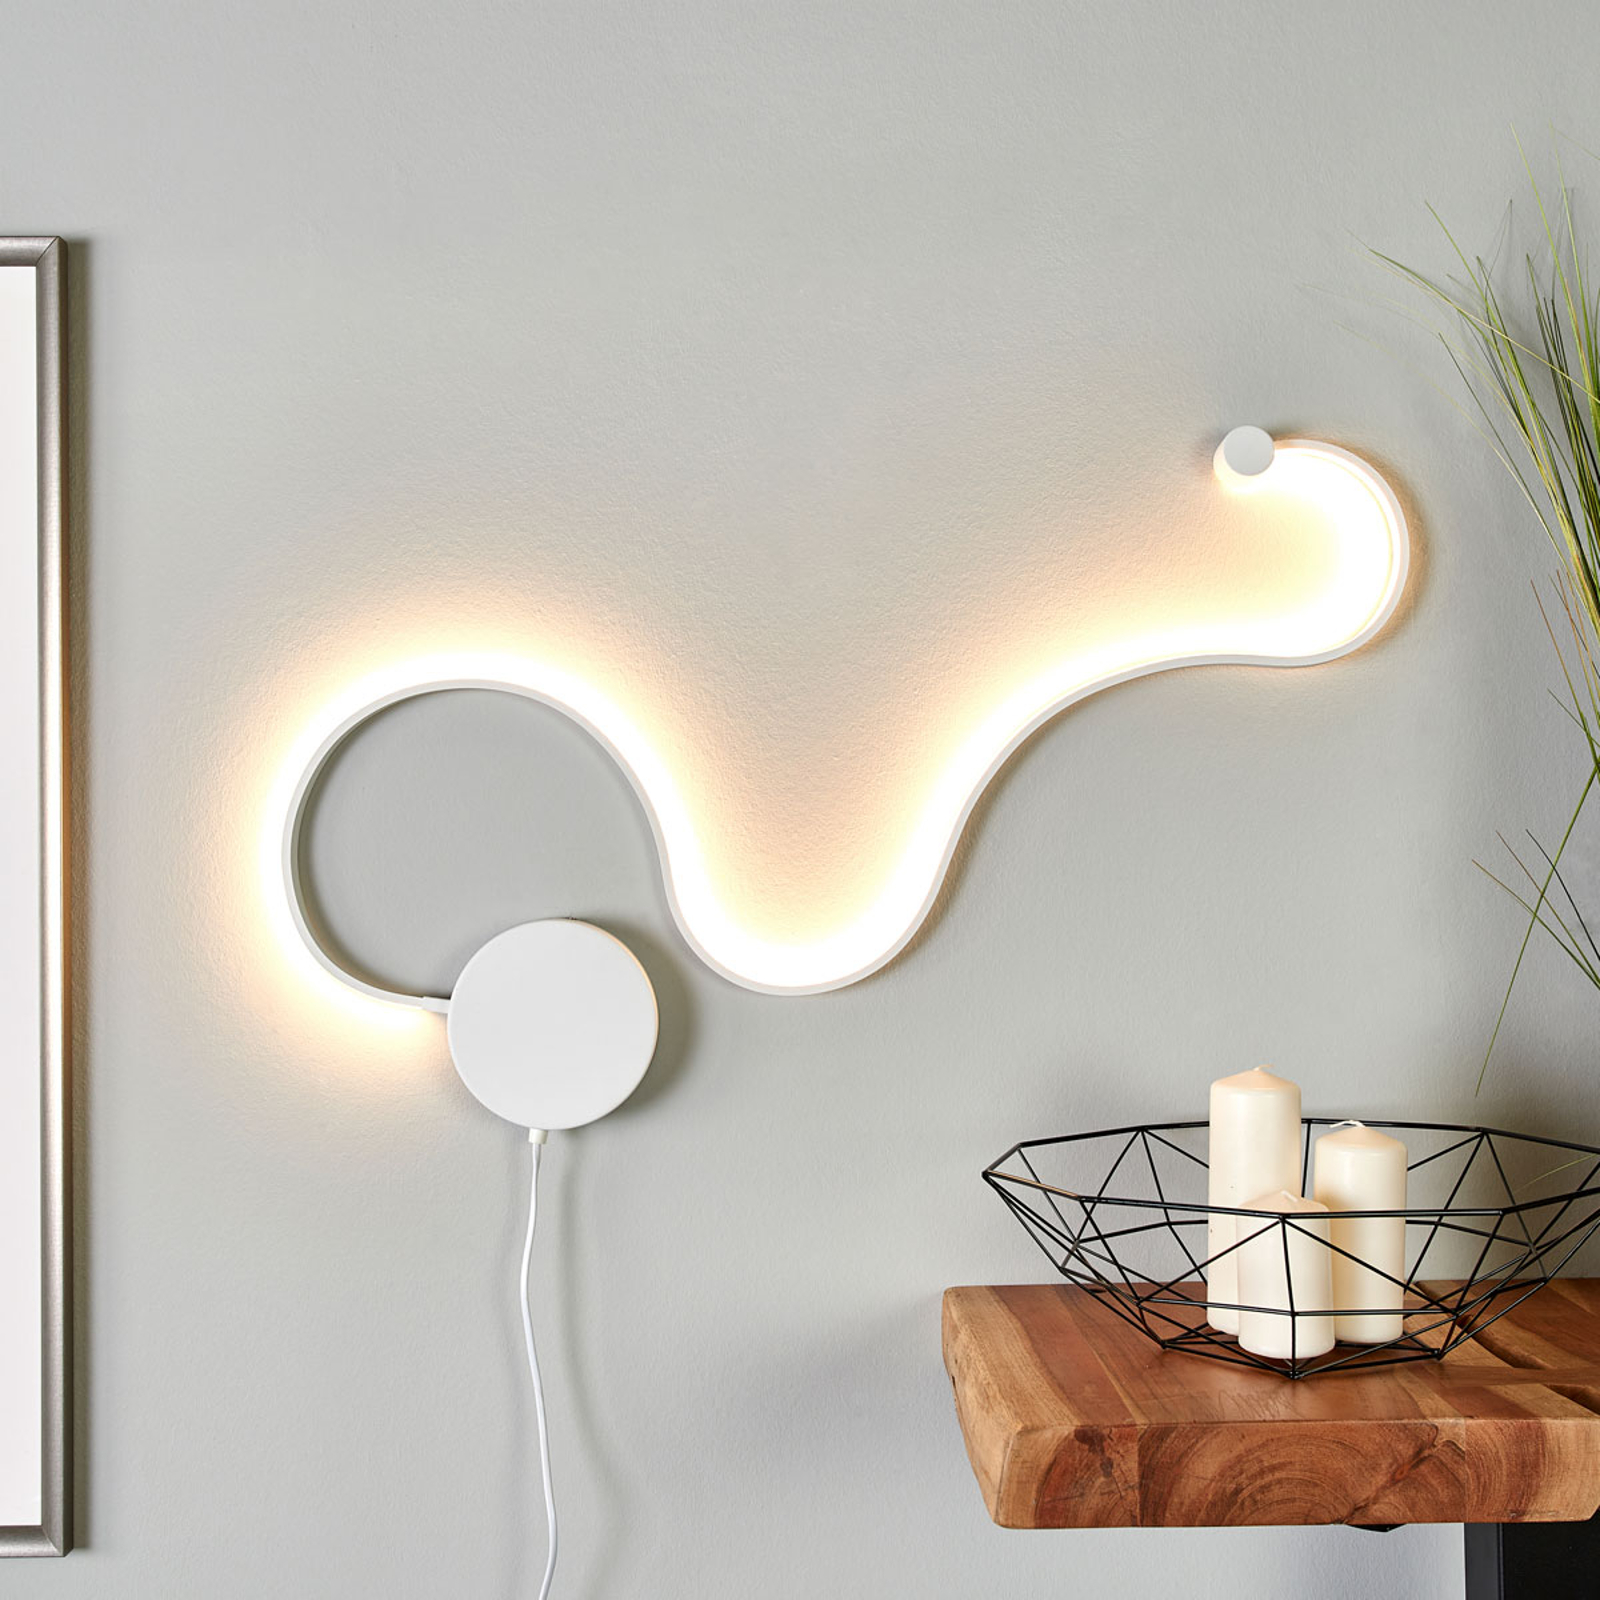 Extravaganta LED-vägglampan Sandor